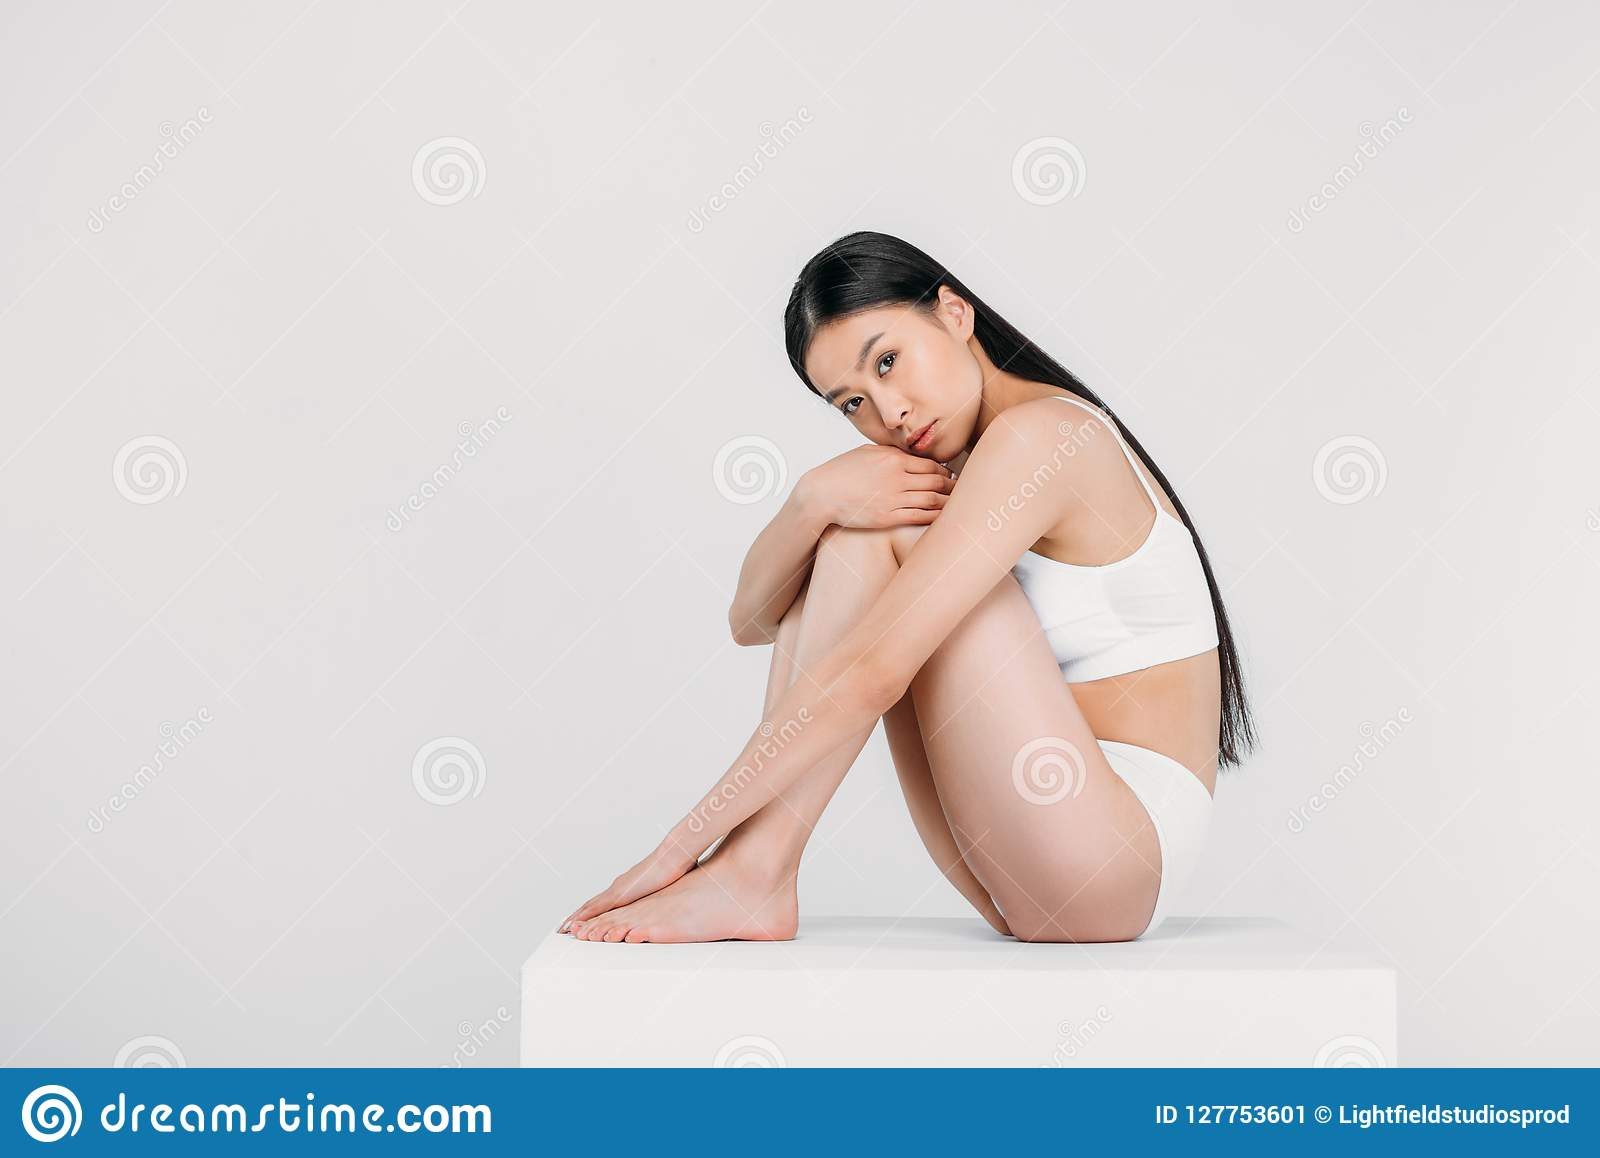 Short gymnast ass porn pic